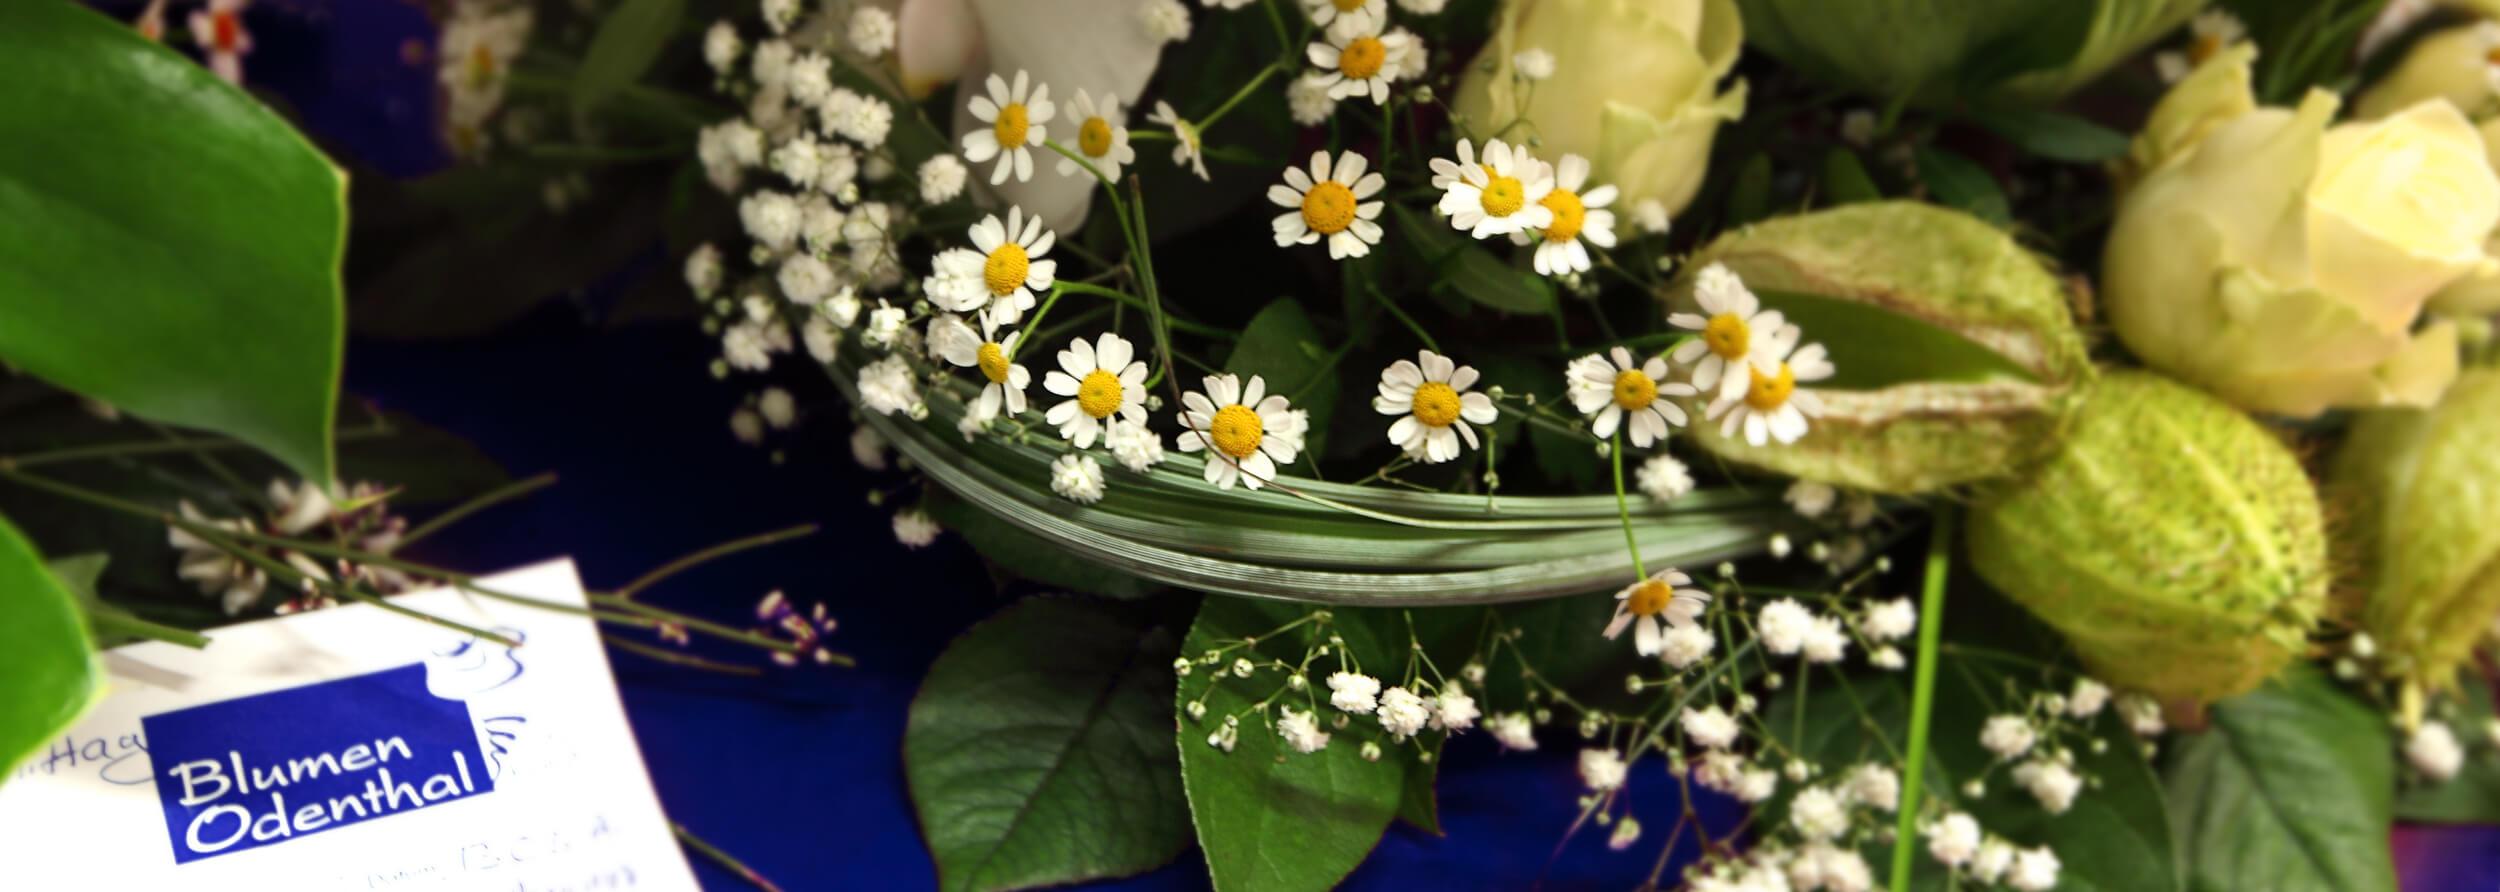 Blumen Odenthal GbR